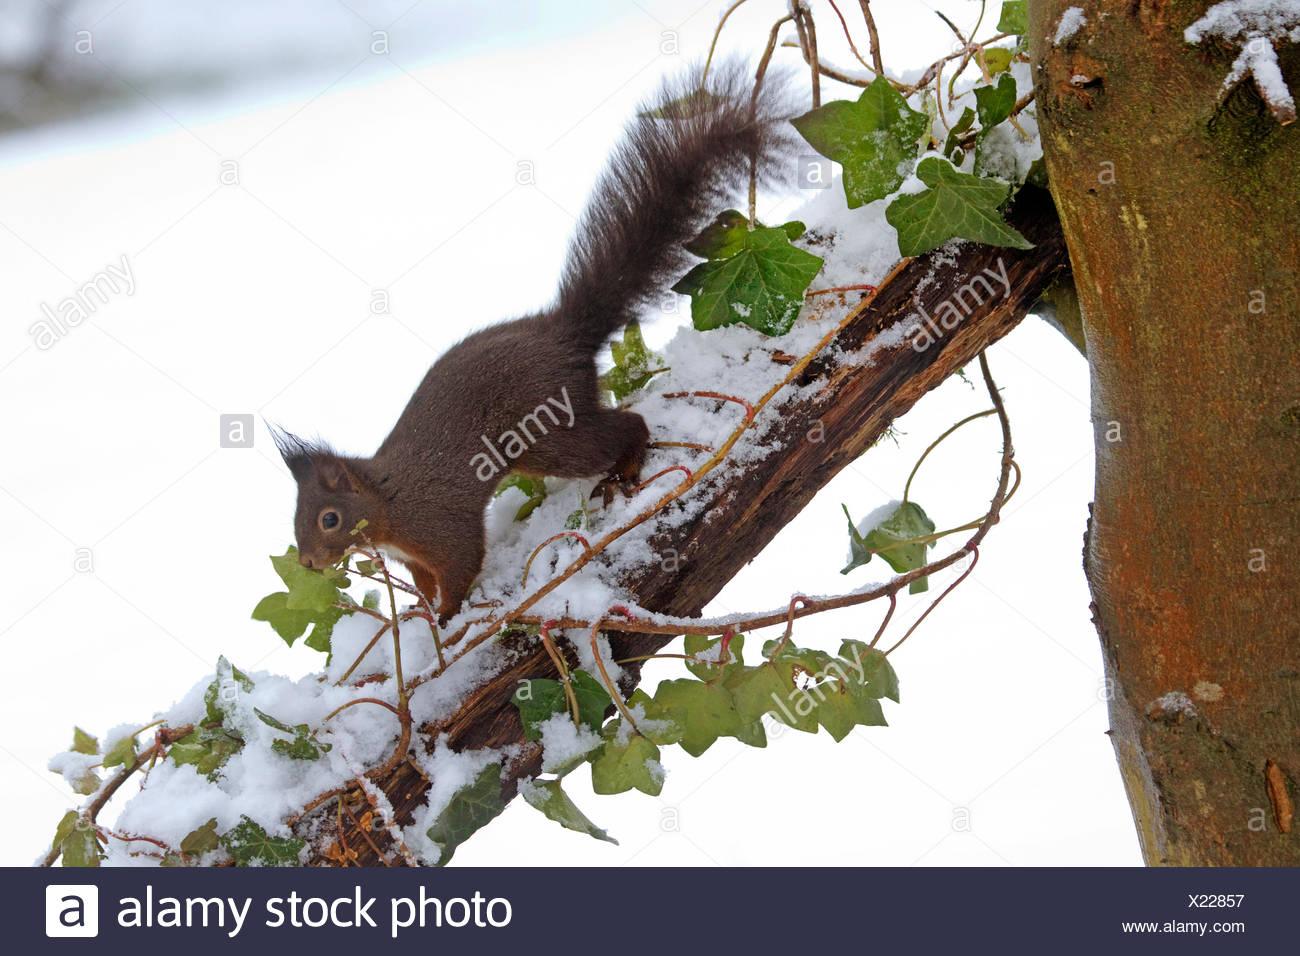 European red squirrel, Eurasian red squirrel (Sciurus vulgaris), searching food by fresh snow on a branch, Germany, North Rhine-Westphalia Stock Photo